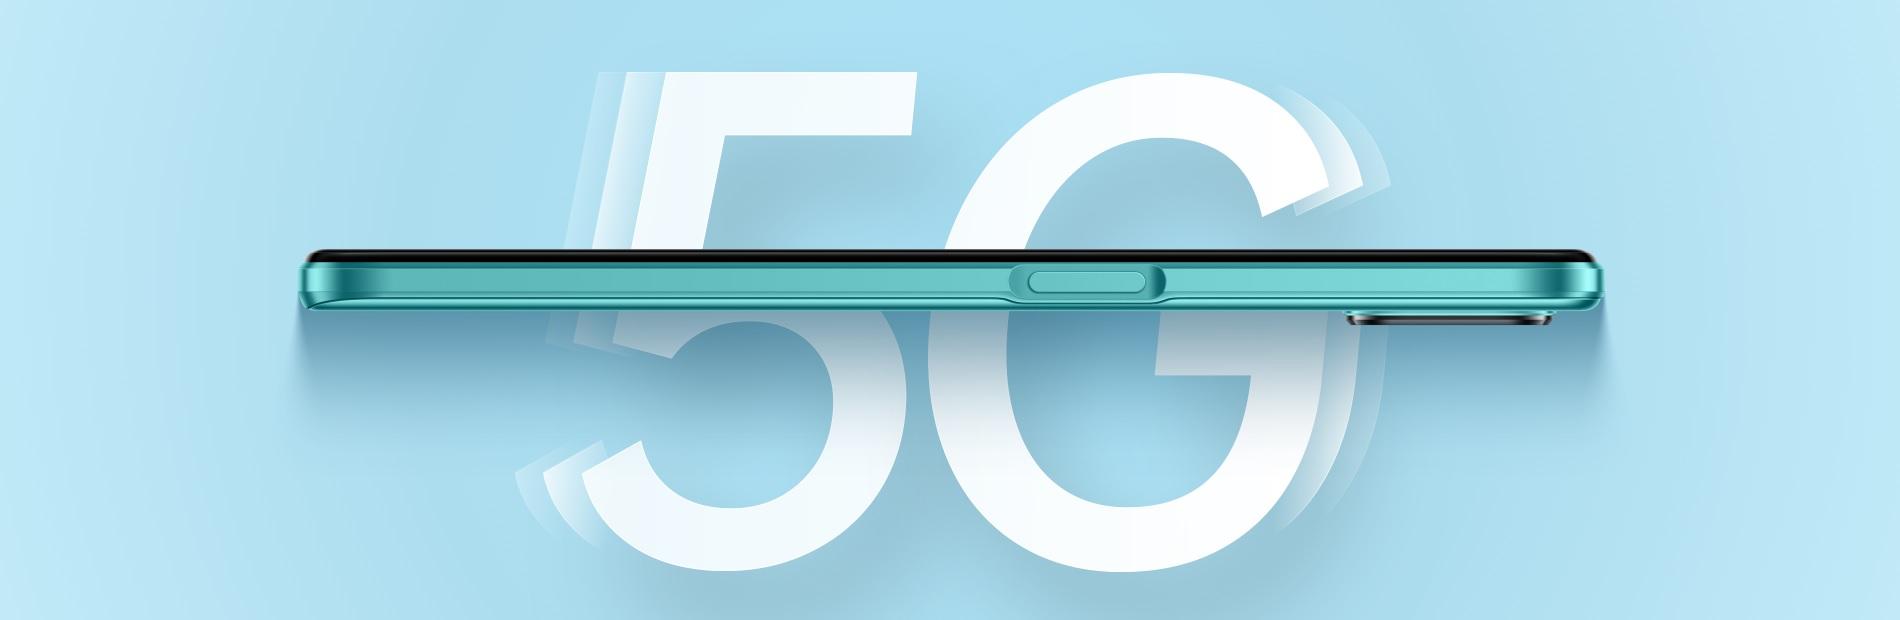 smartfon Oppo A53 5G smartphone